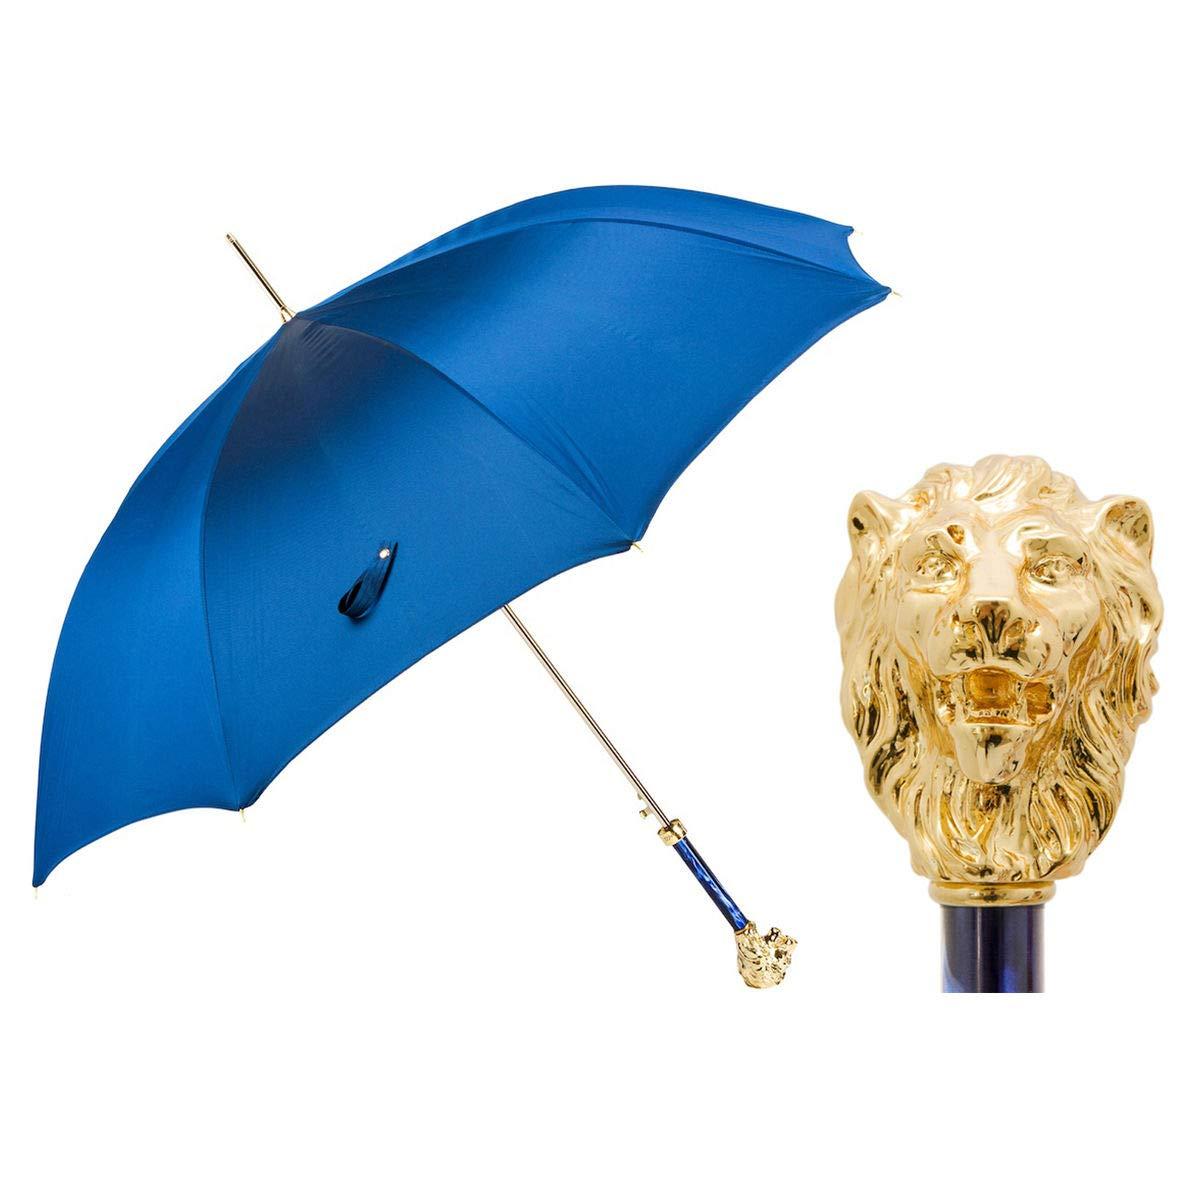 Pasotti Ombrelli Golden Lion Walking Stick Umbrella W37PB by Fama